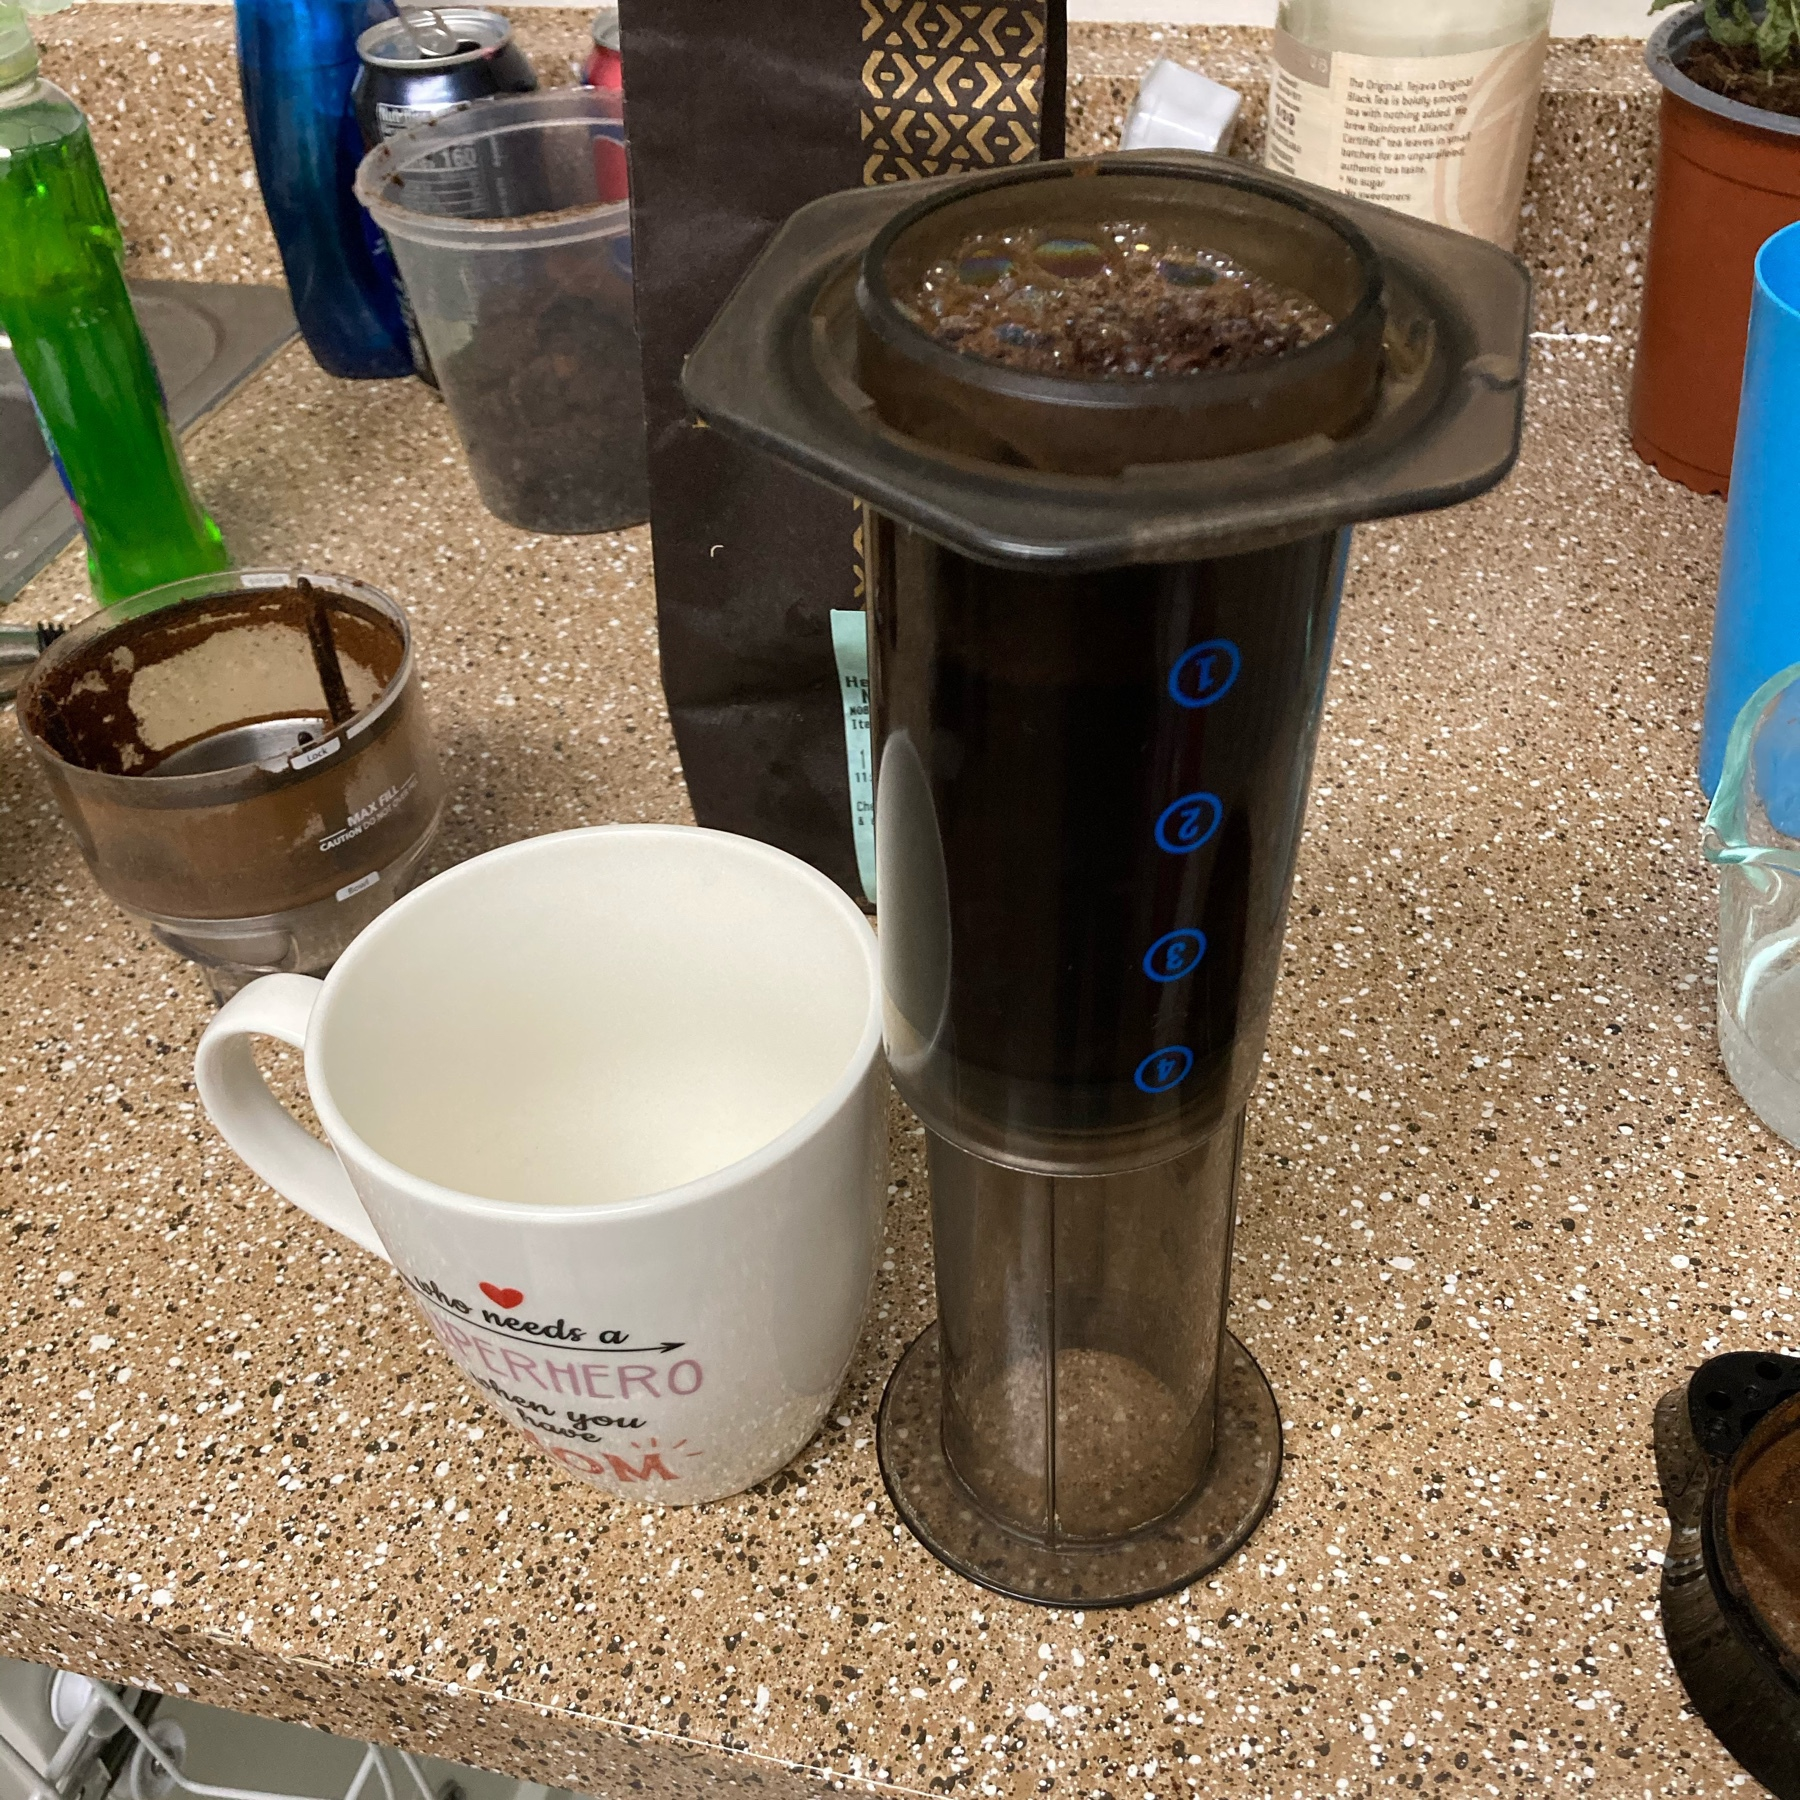 Aeropress making coffee.